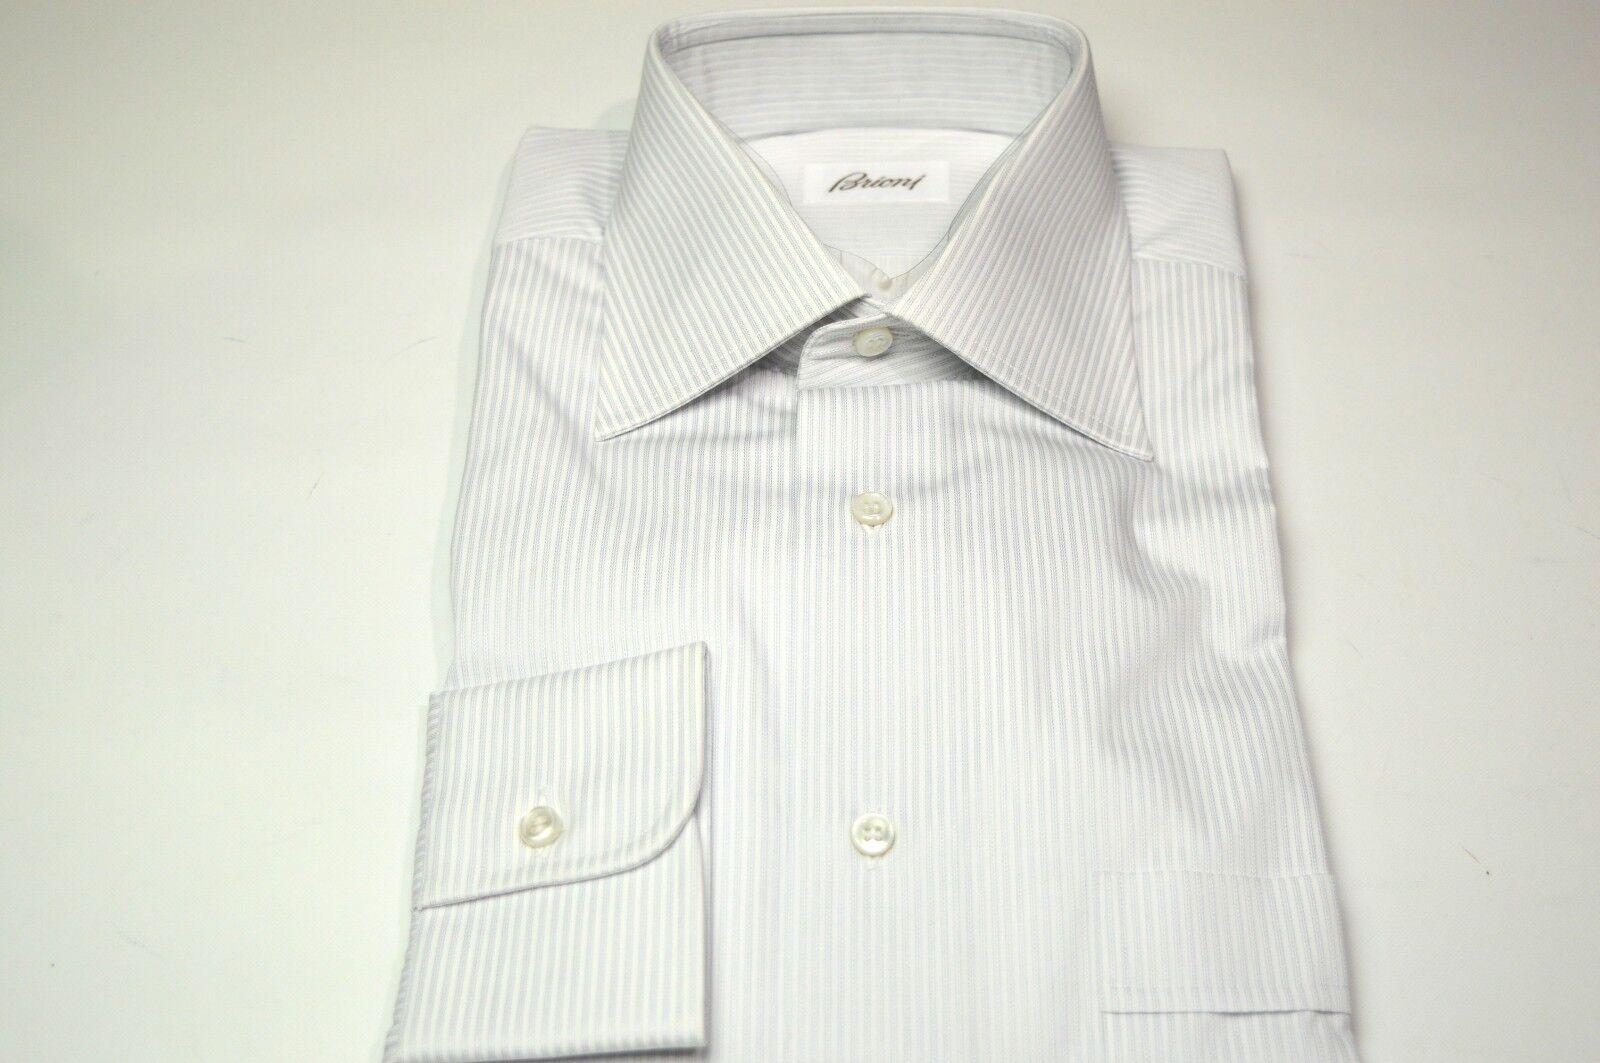 NEW  BRIONI Dress  SHIRT 100% Cotton Size 15.75 Us 40 Eu  (ARA48)